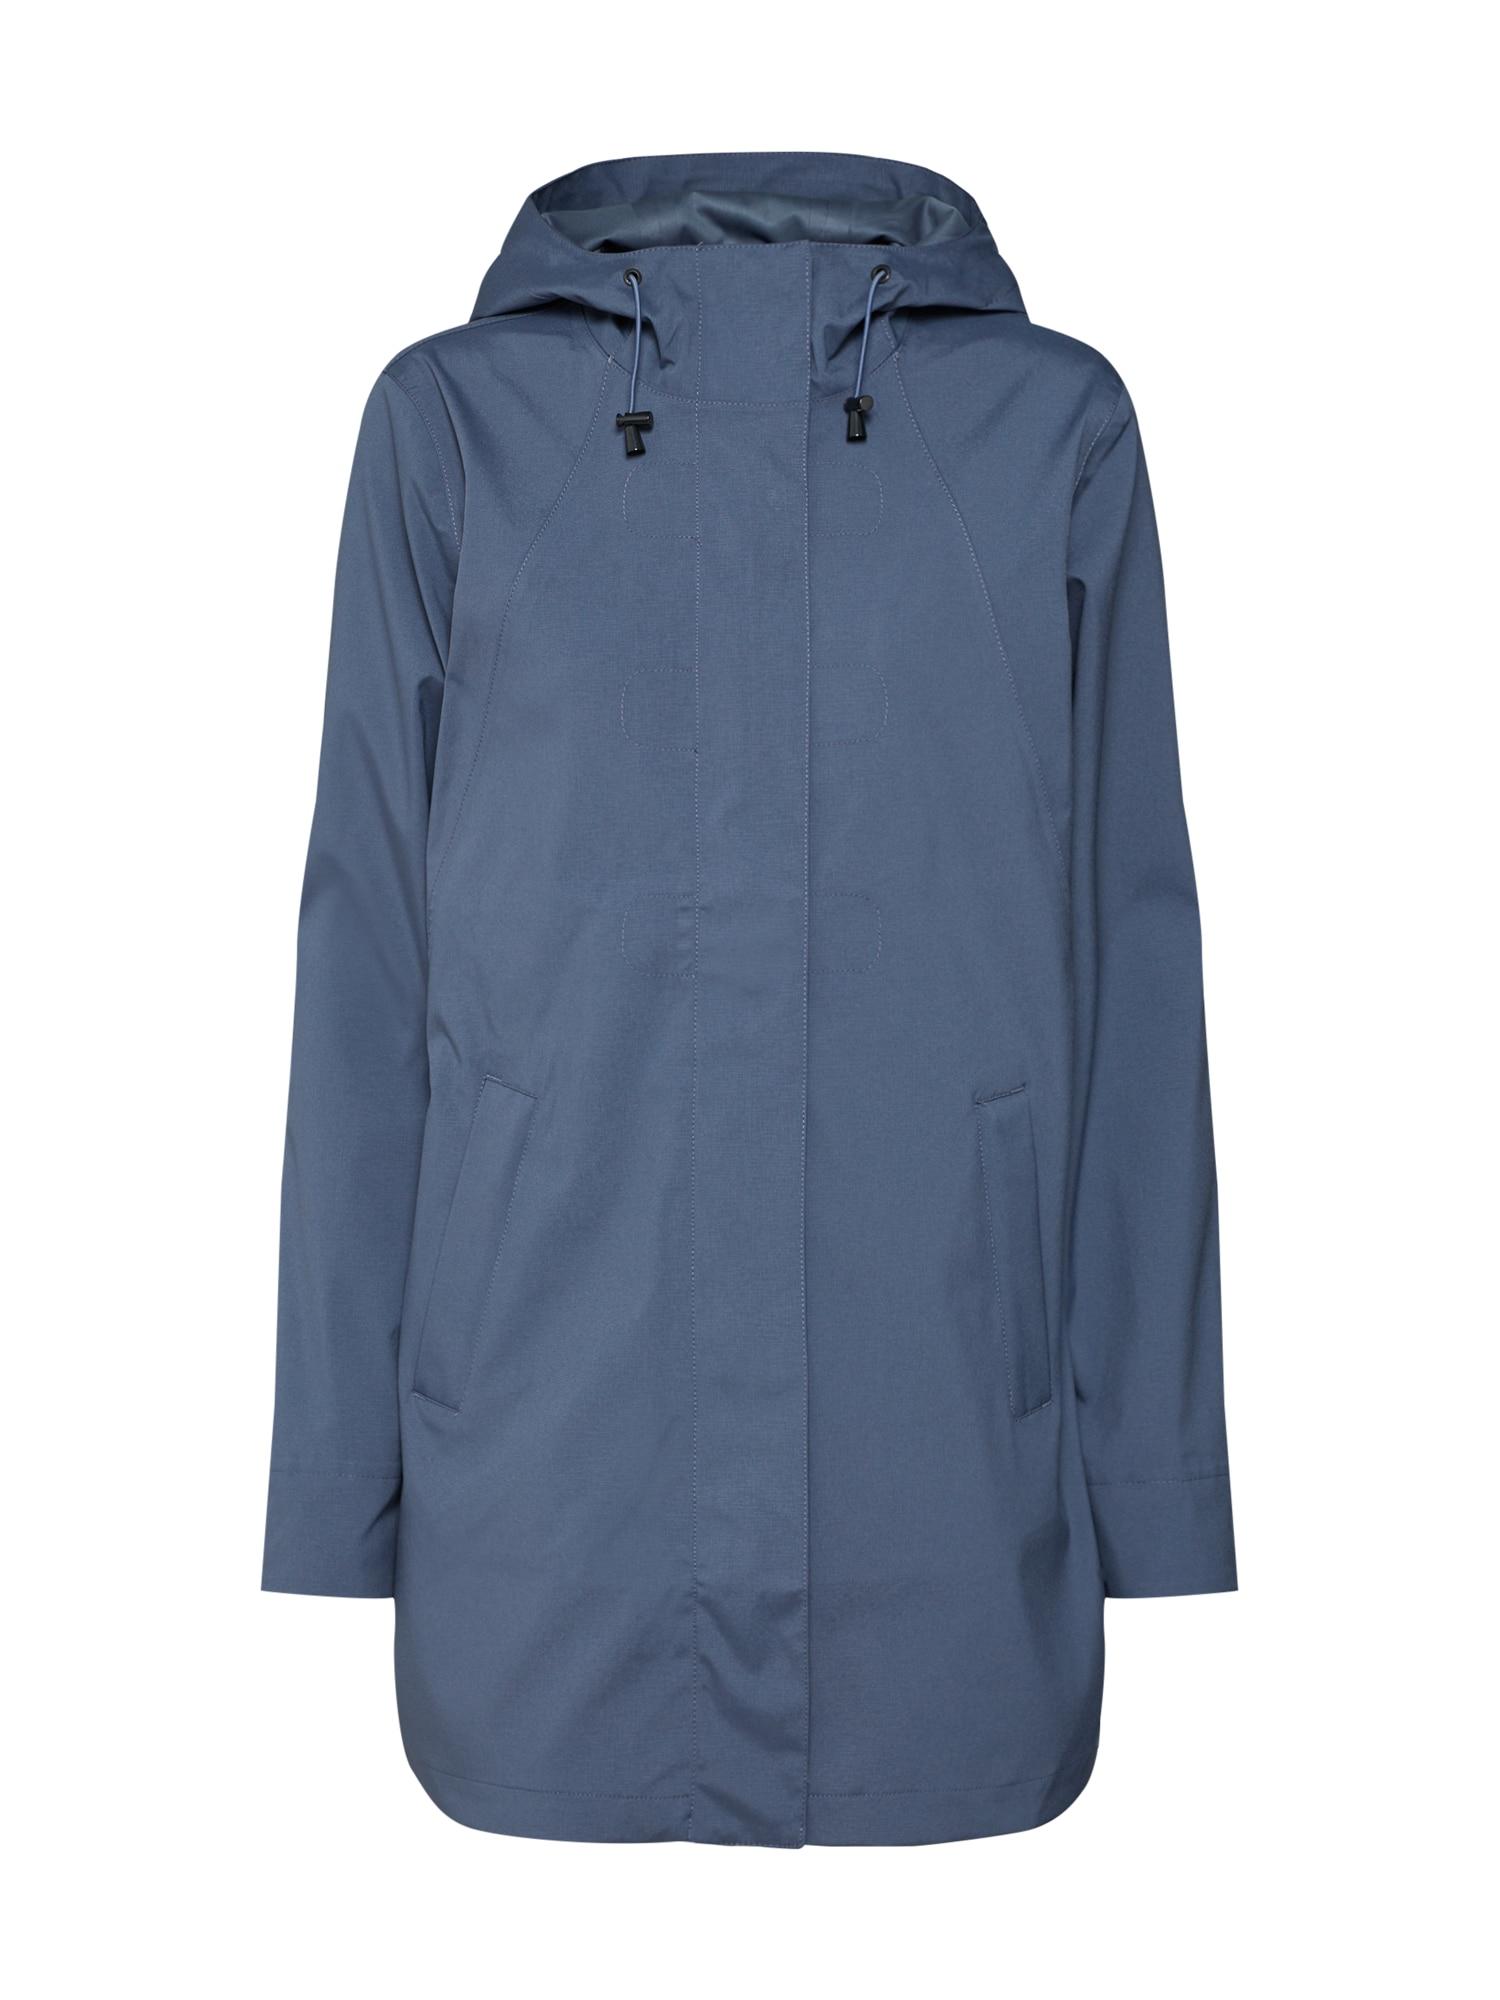 Přechodná bunda chladná modrá ILSE JACOBSEN